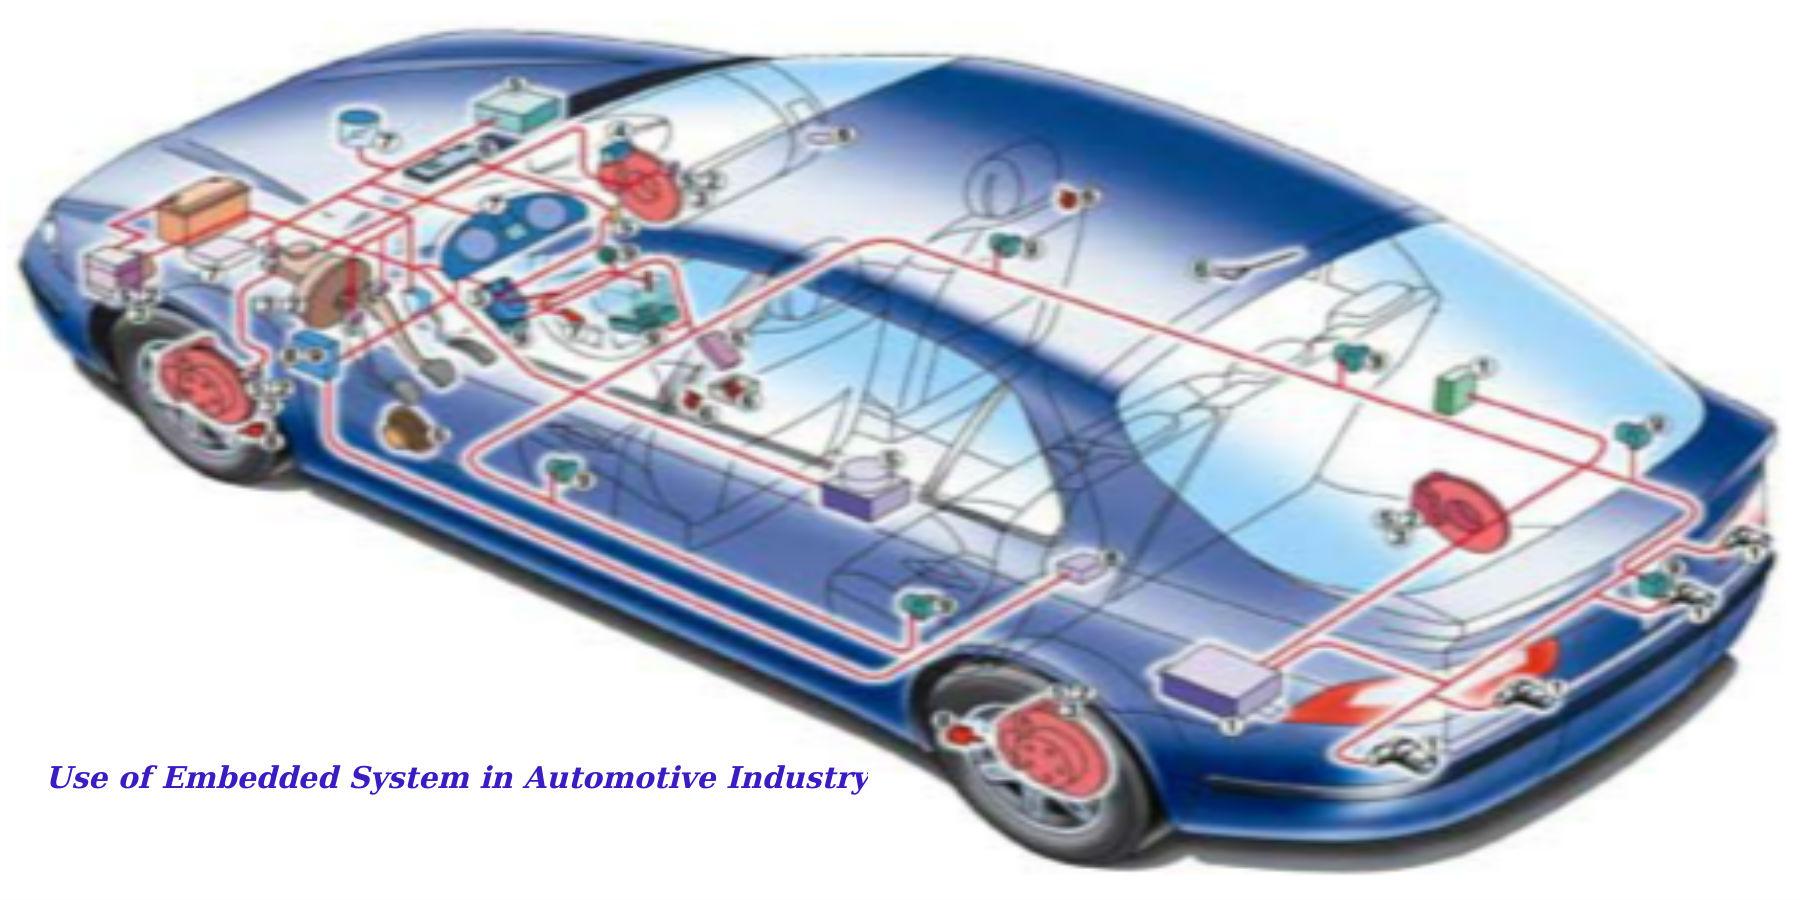 automotive industry embedded system